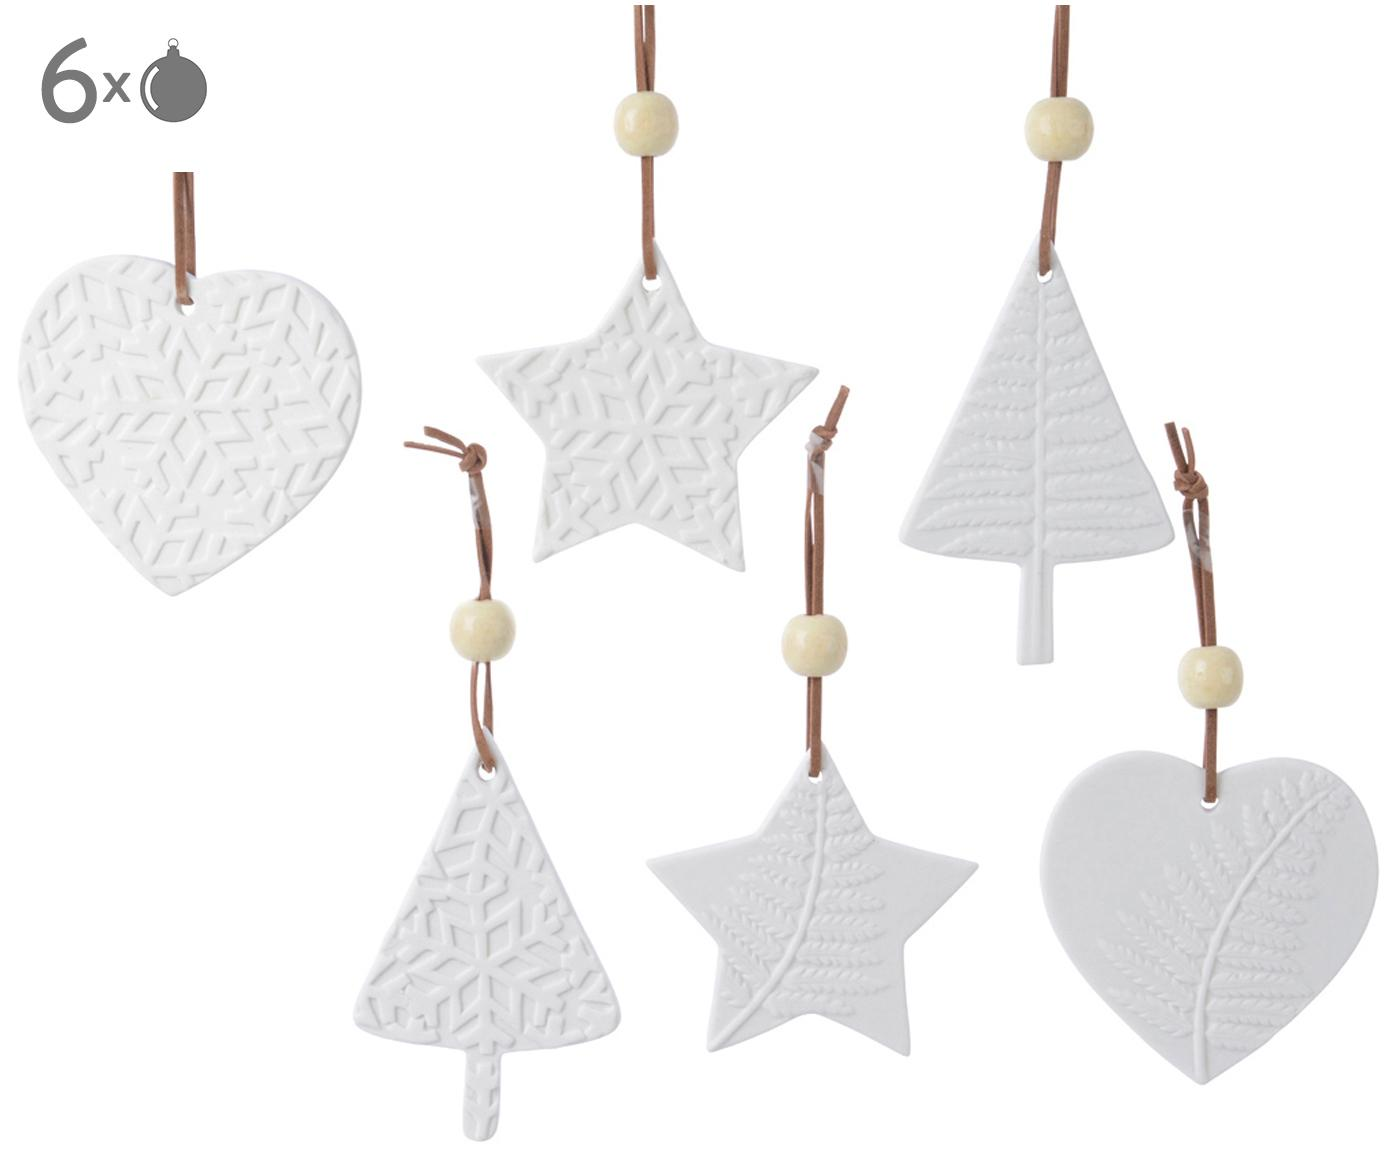 Set ciondoli Joy, 6 pz., Bianco, Larg. 8 x Alt. 8 cm